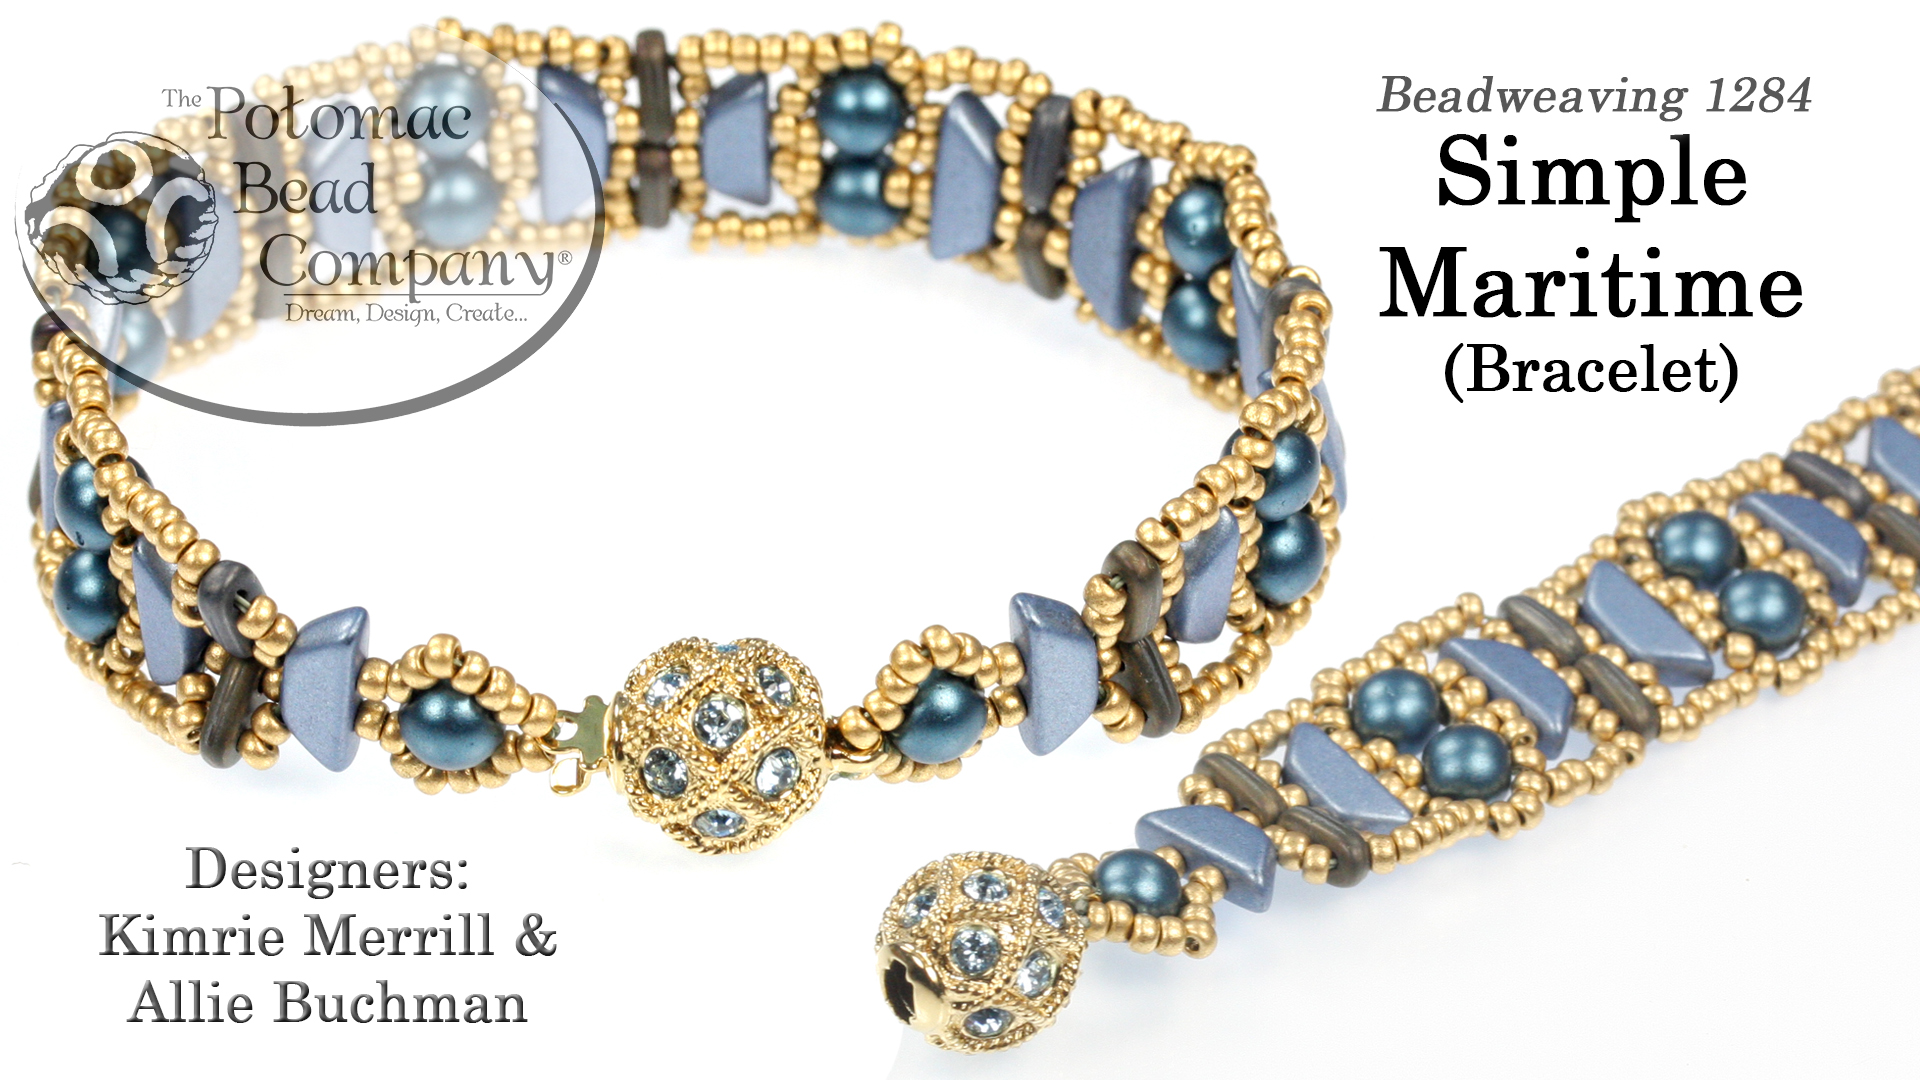 How to Bead Jewelry / Beading Tutorials & Jewel Making Videos / Bracelet Projects / Simple Maritime Bracelet Tutorial